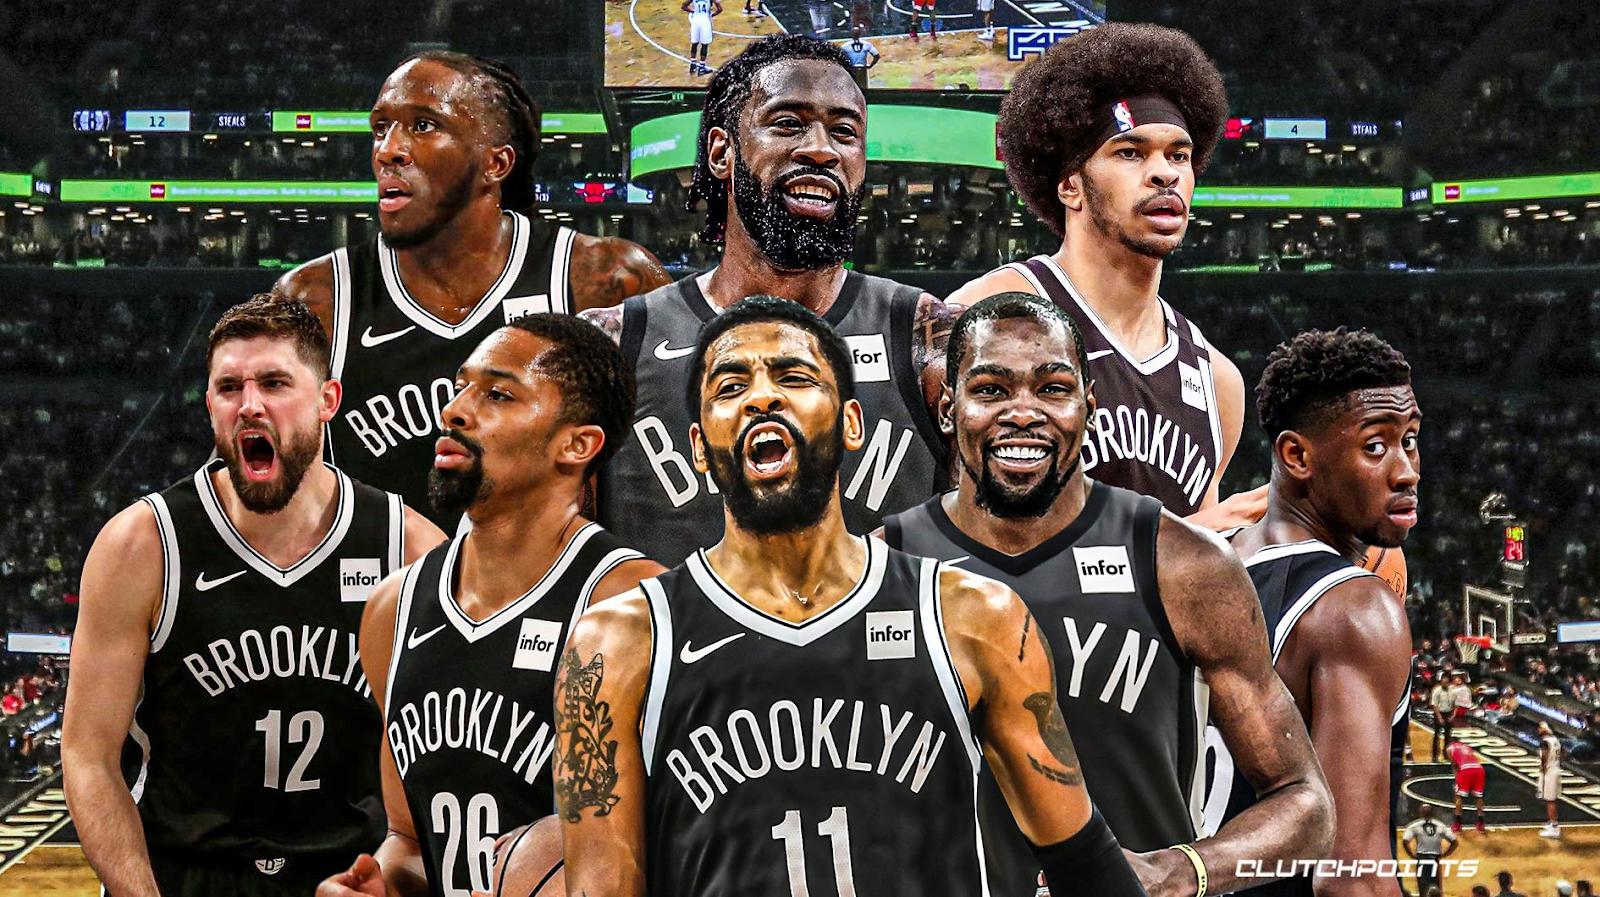 Do You Want To Read Watch Nba Orlando Magic Vs Brooklyn Nets 12 08 2020 Matchup Preview In 2020 Orlando Magic Brooklyn Nets Watch Nba